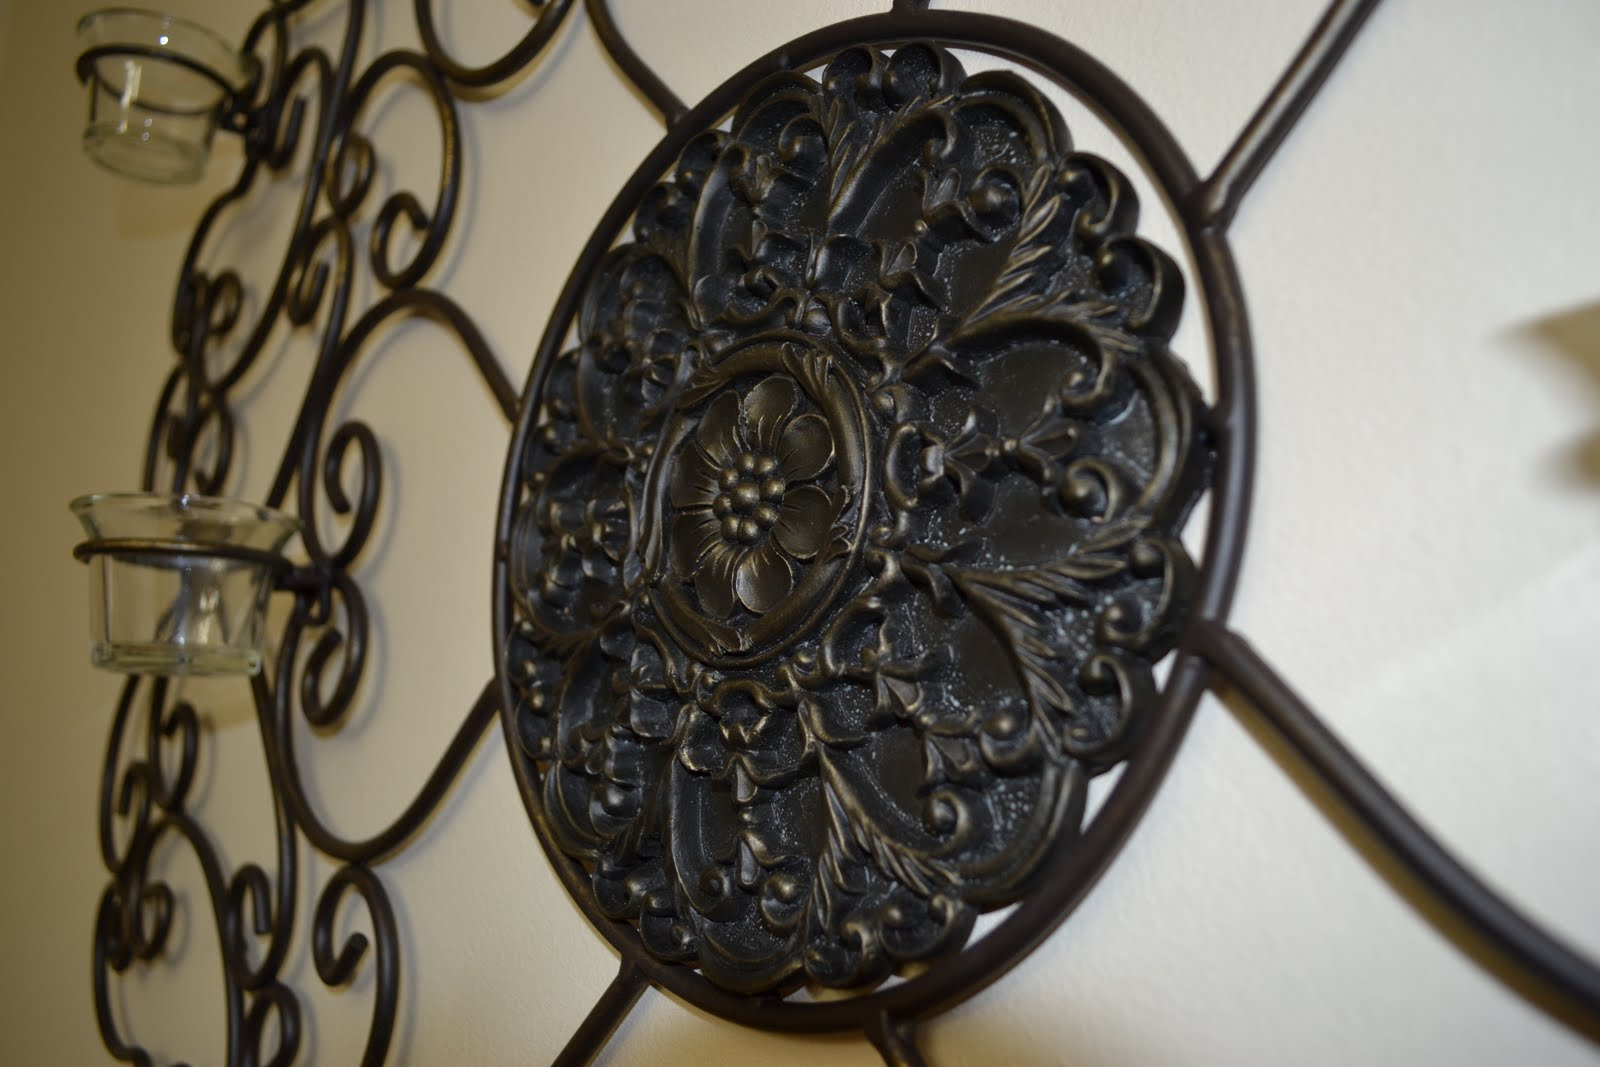 Hobby Lobby Elephant Wall Decor : Southern charm house tour the dining room